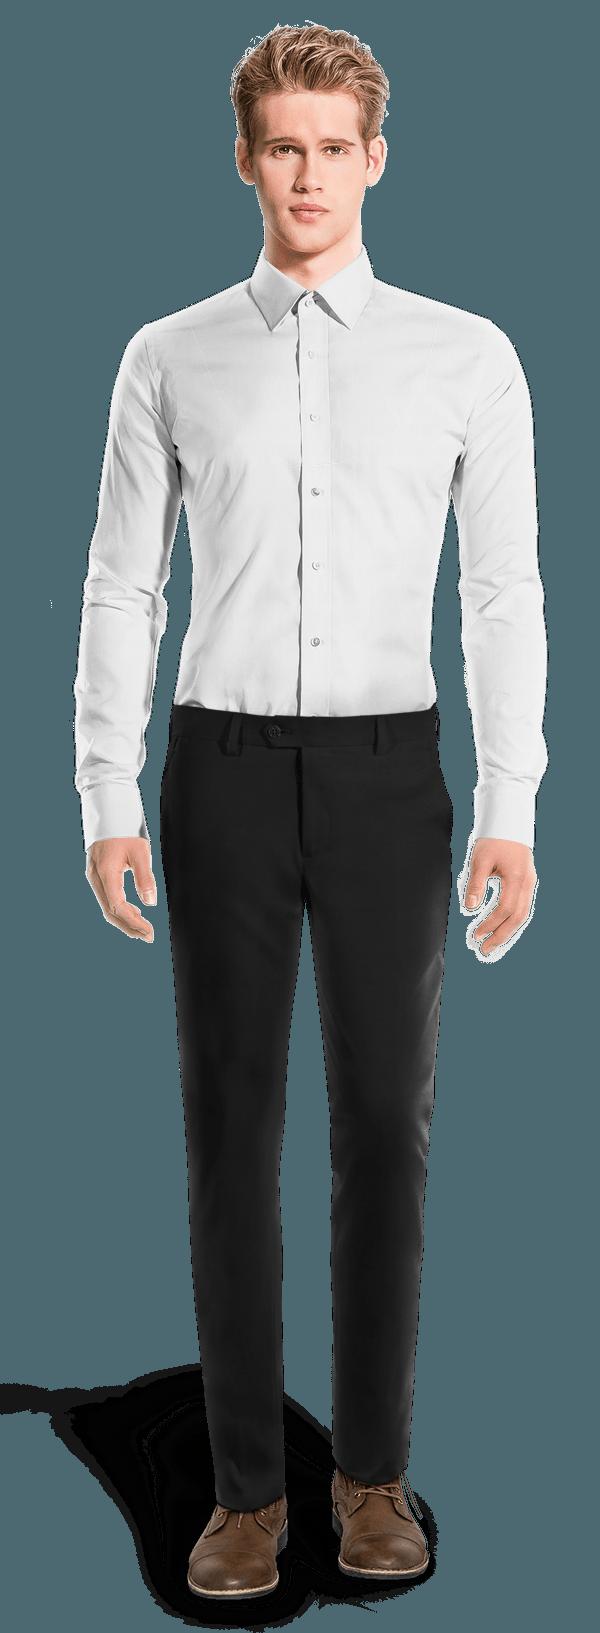 Pantaloni chino slim fit neri